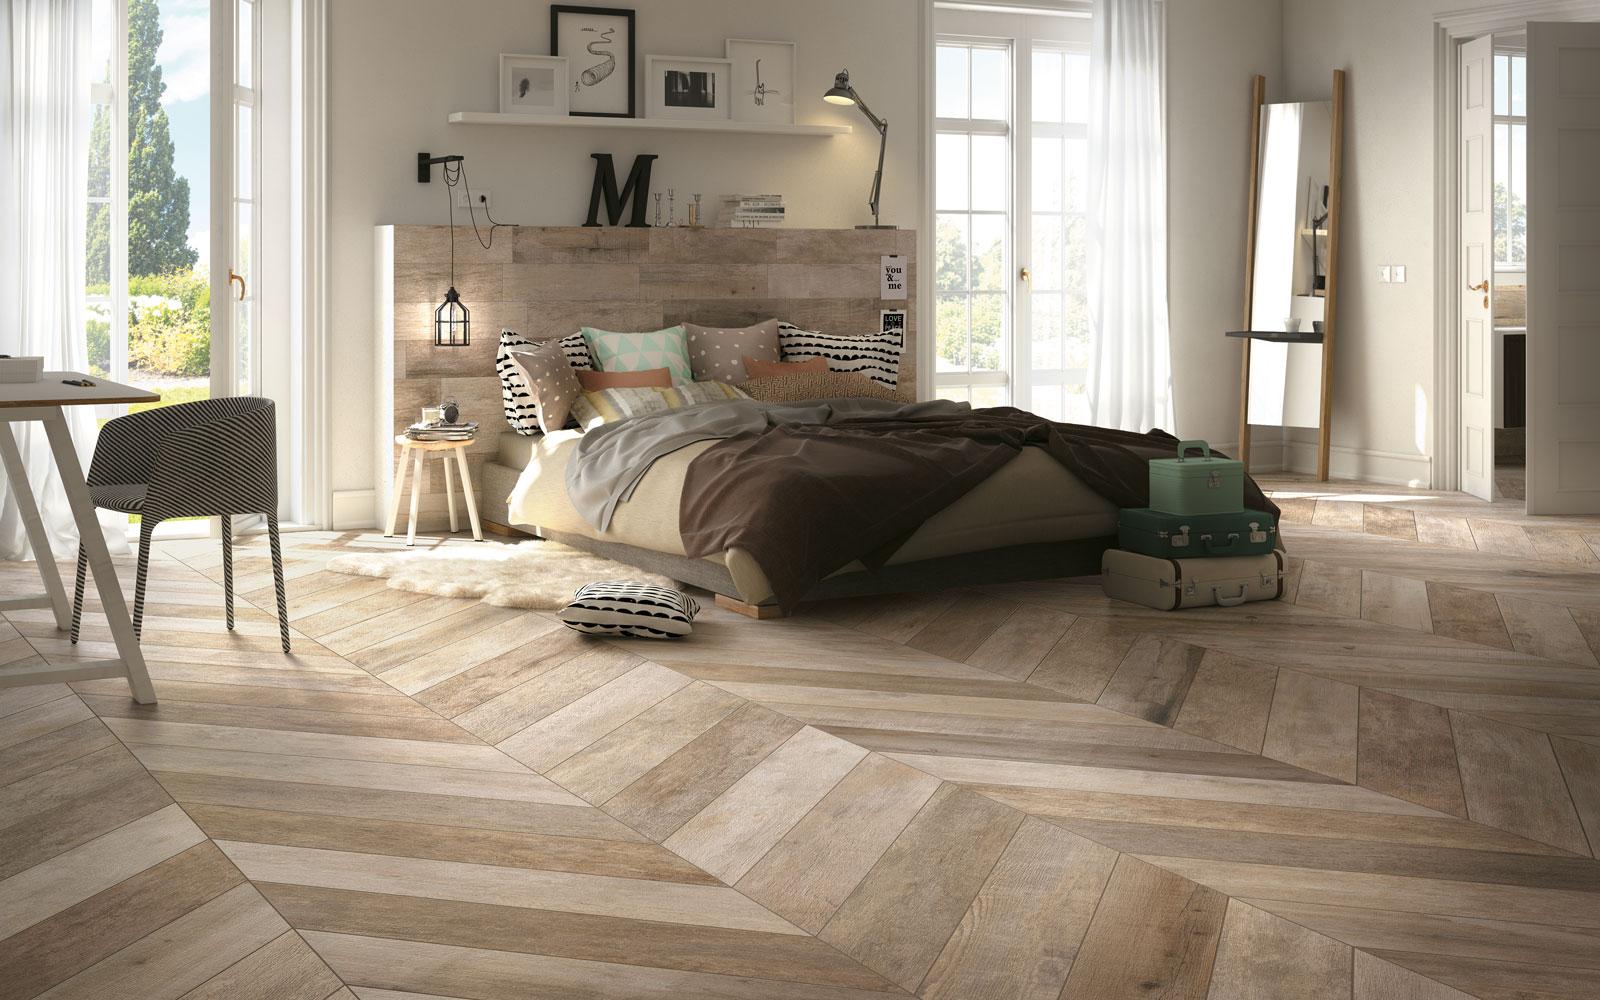 Wonen op hout | Houten vloeren